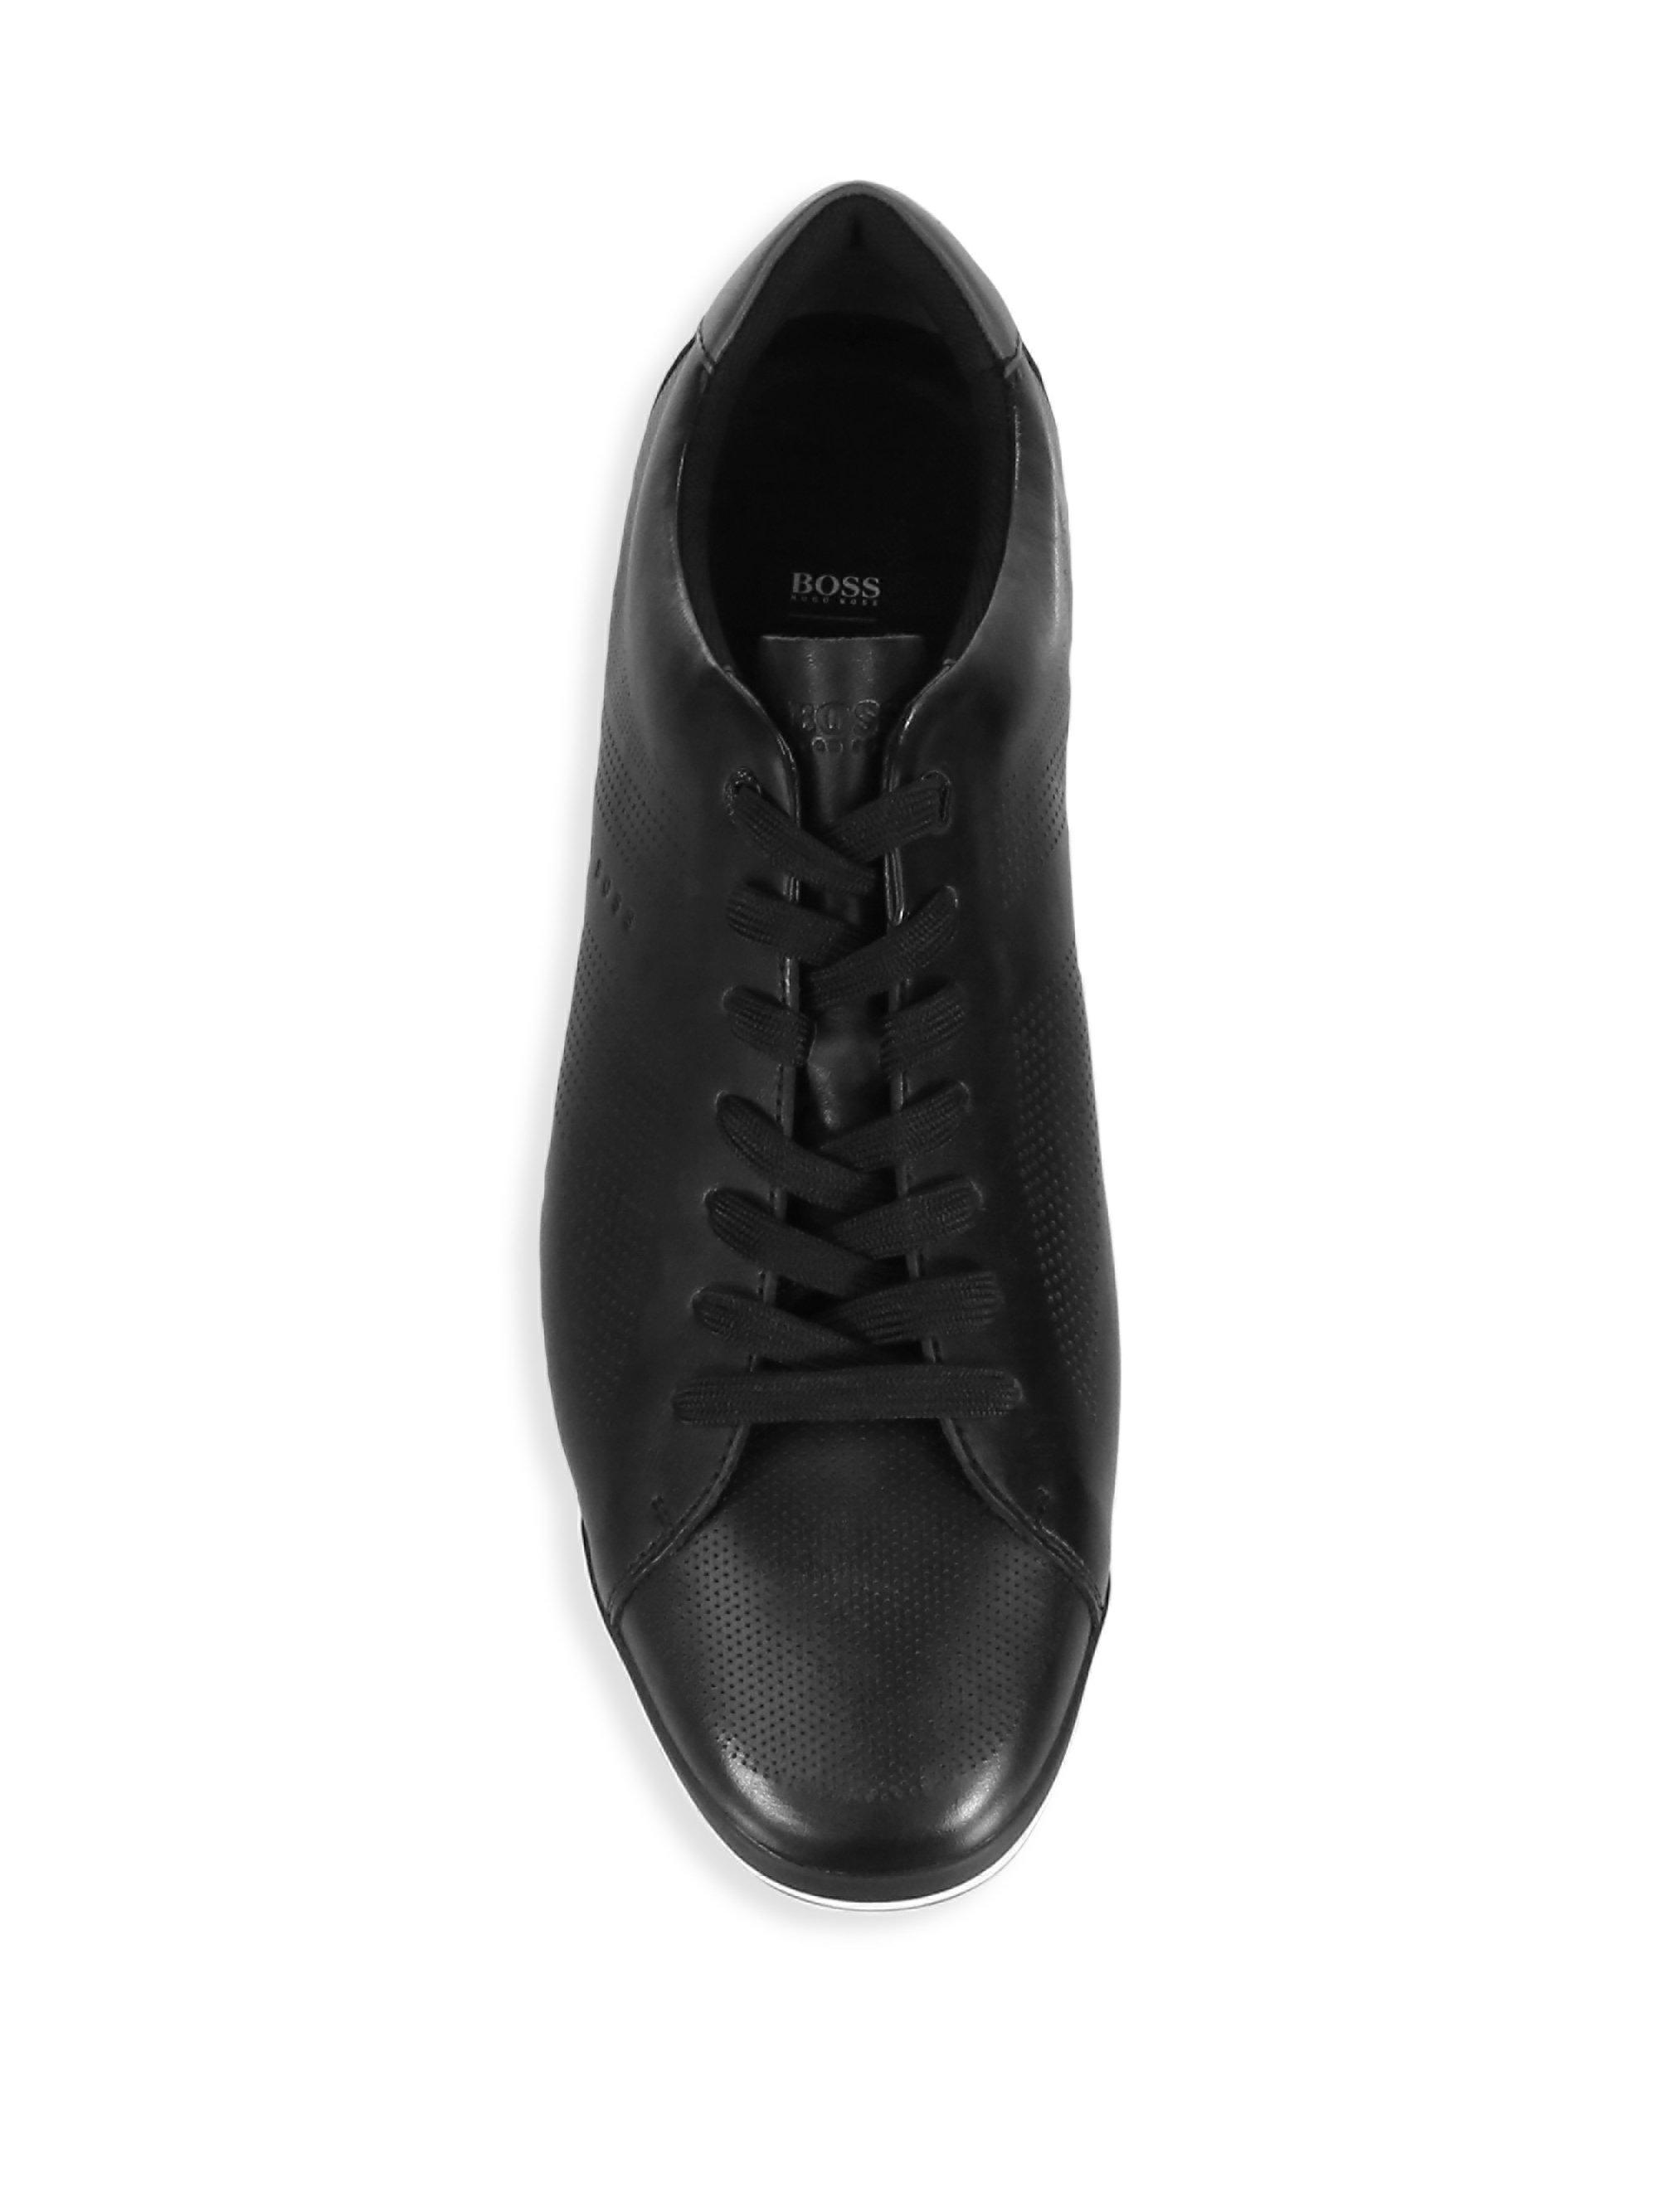 SATURN - Sneaker low - black Rabatt Niedriger Versand Billig Zum Verkauf Auslass 100% Original Auslass Nicekicks LAa02